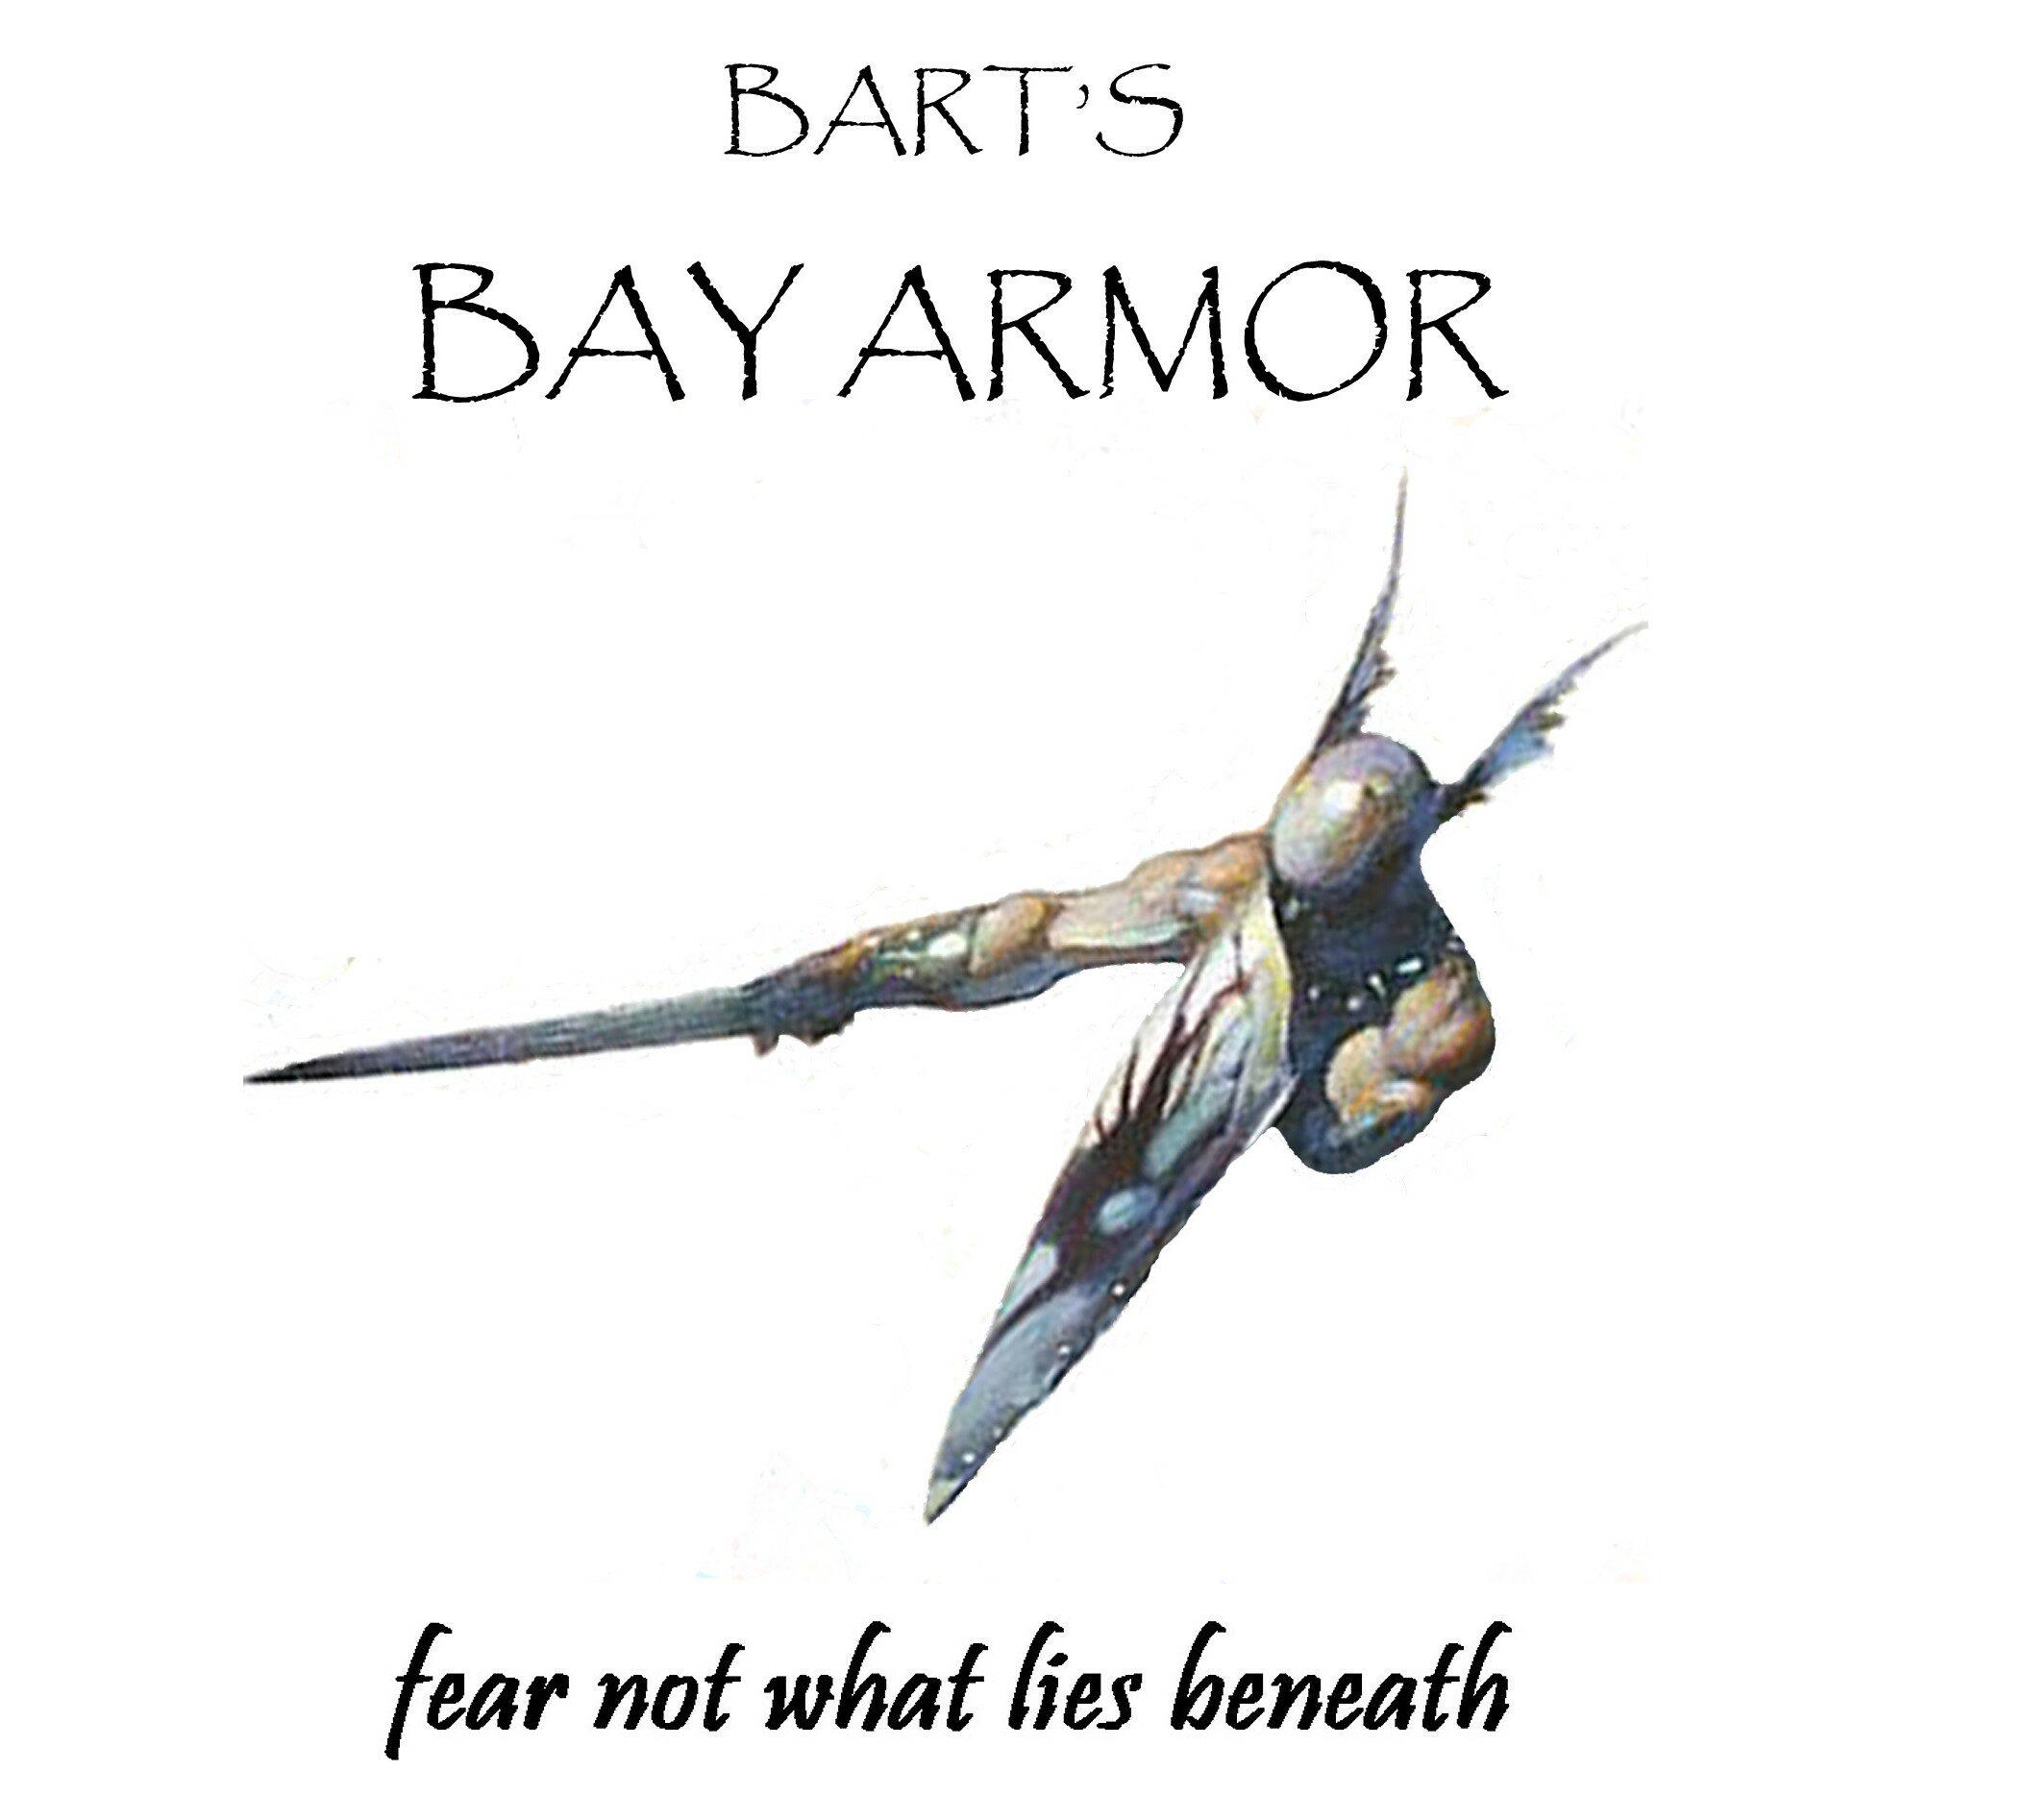 Bart's Bay Armor™